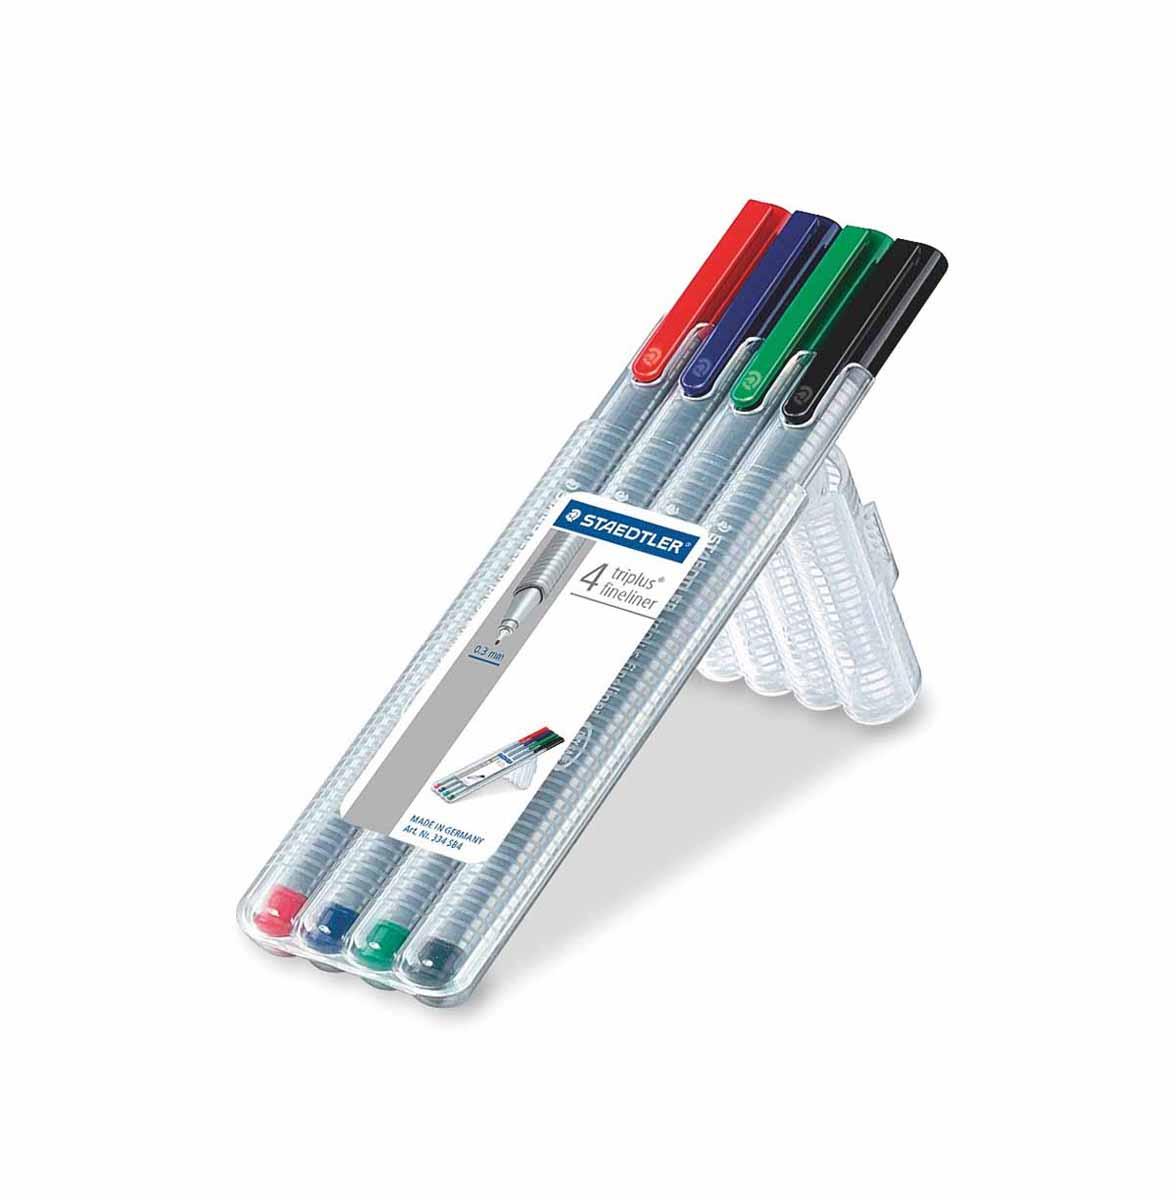 Staedtler Набор капиллярных ручек Triplus 4 цвета staedtler набор капиллярных ручек triplus 3 цвета